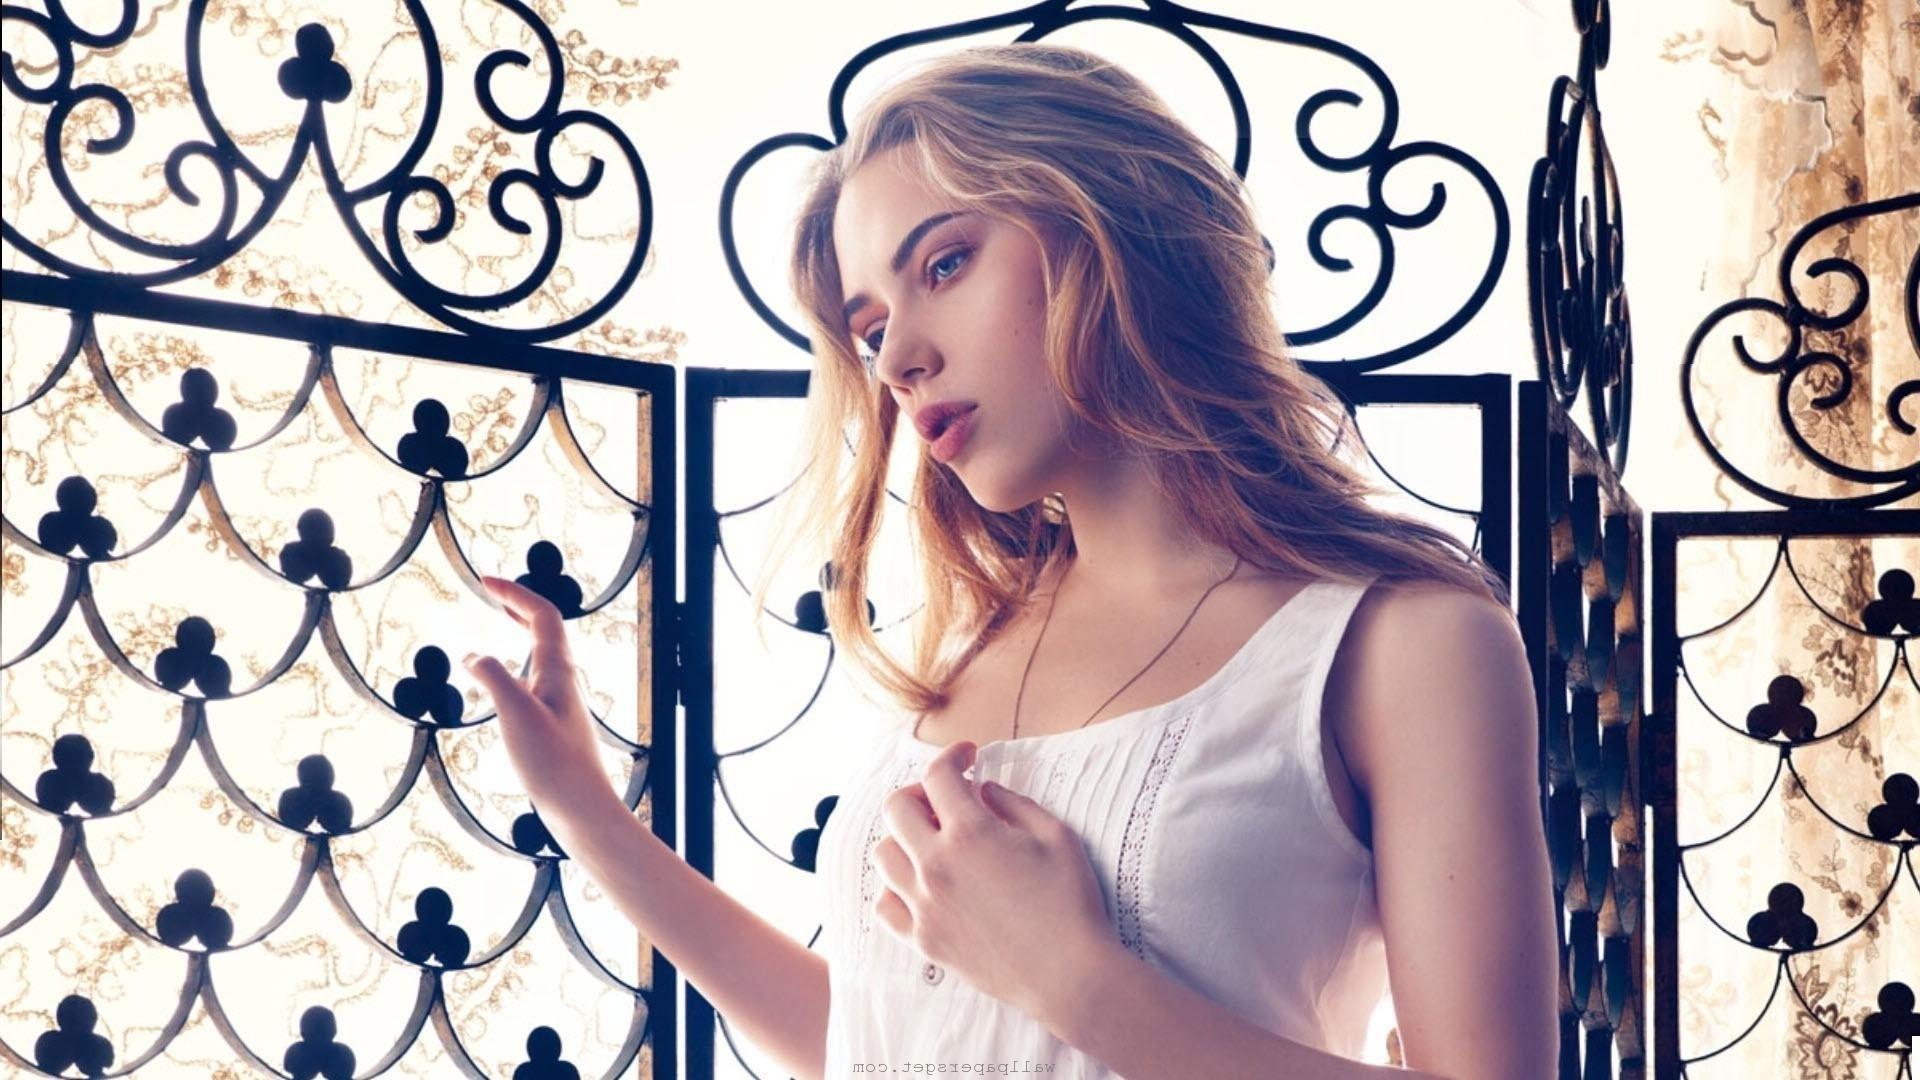 Scarlett Johansson HD Desktop Wallpaper